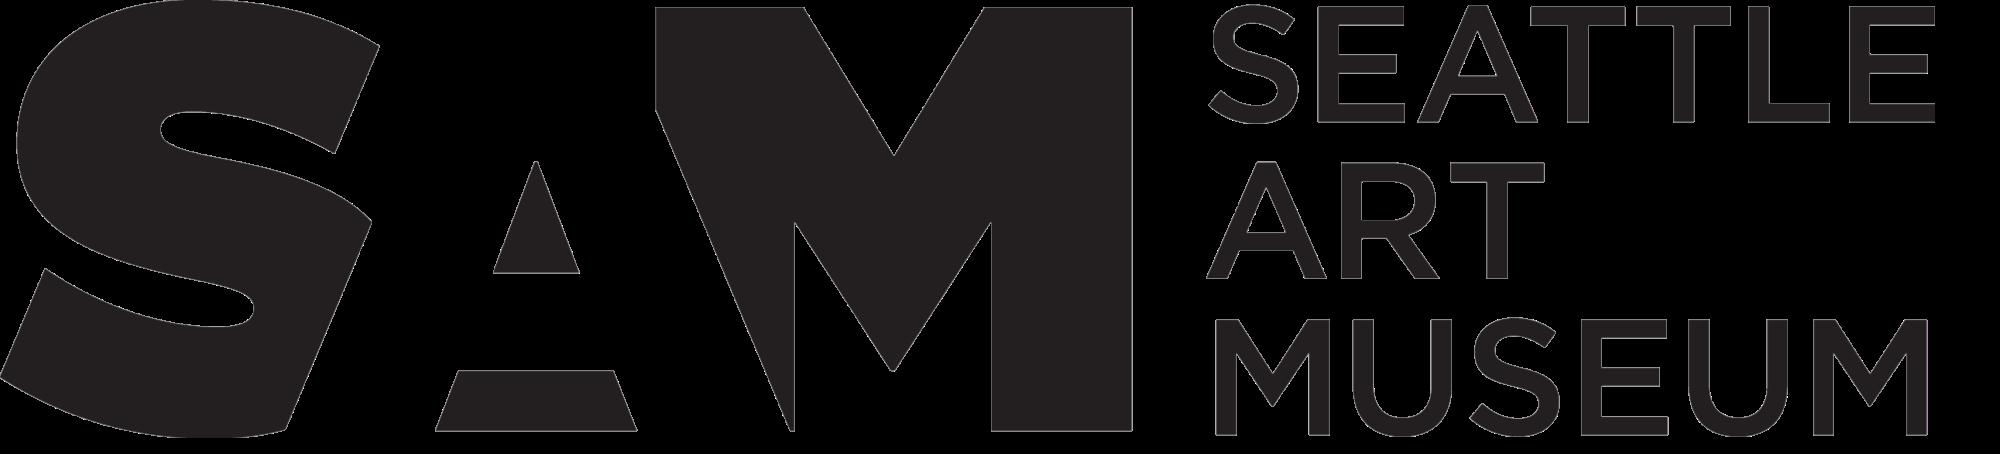 Seattle_Art_Museum_logo.png